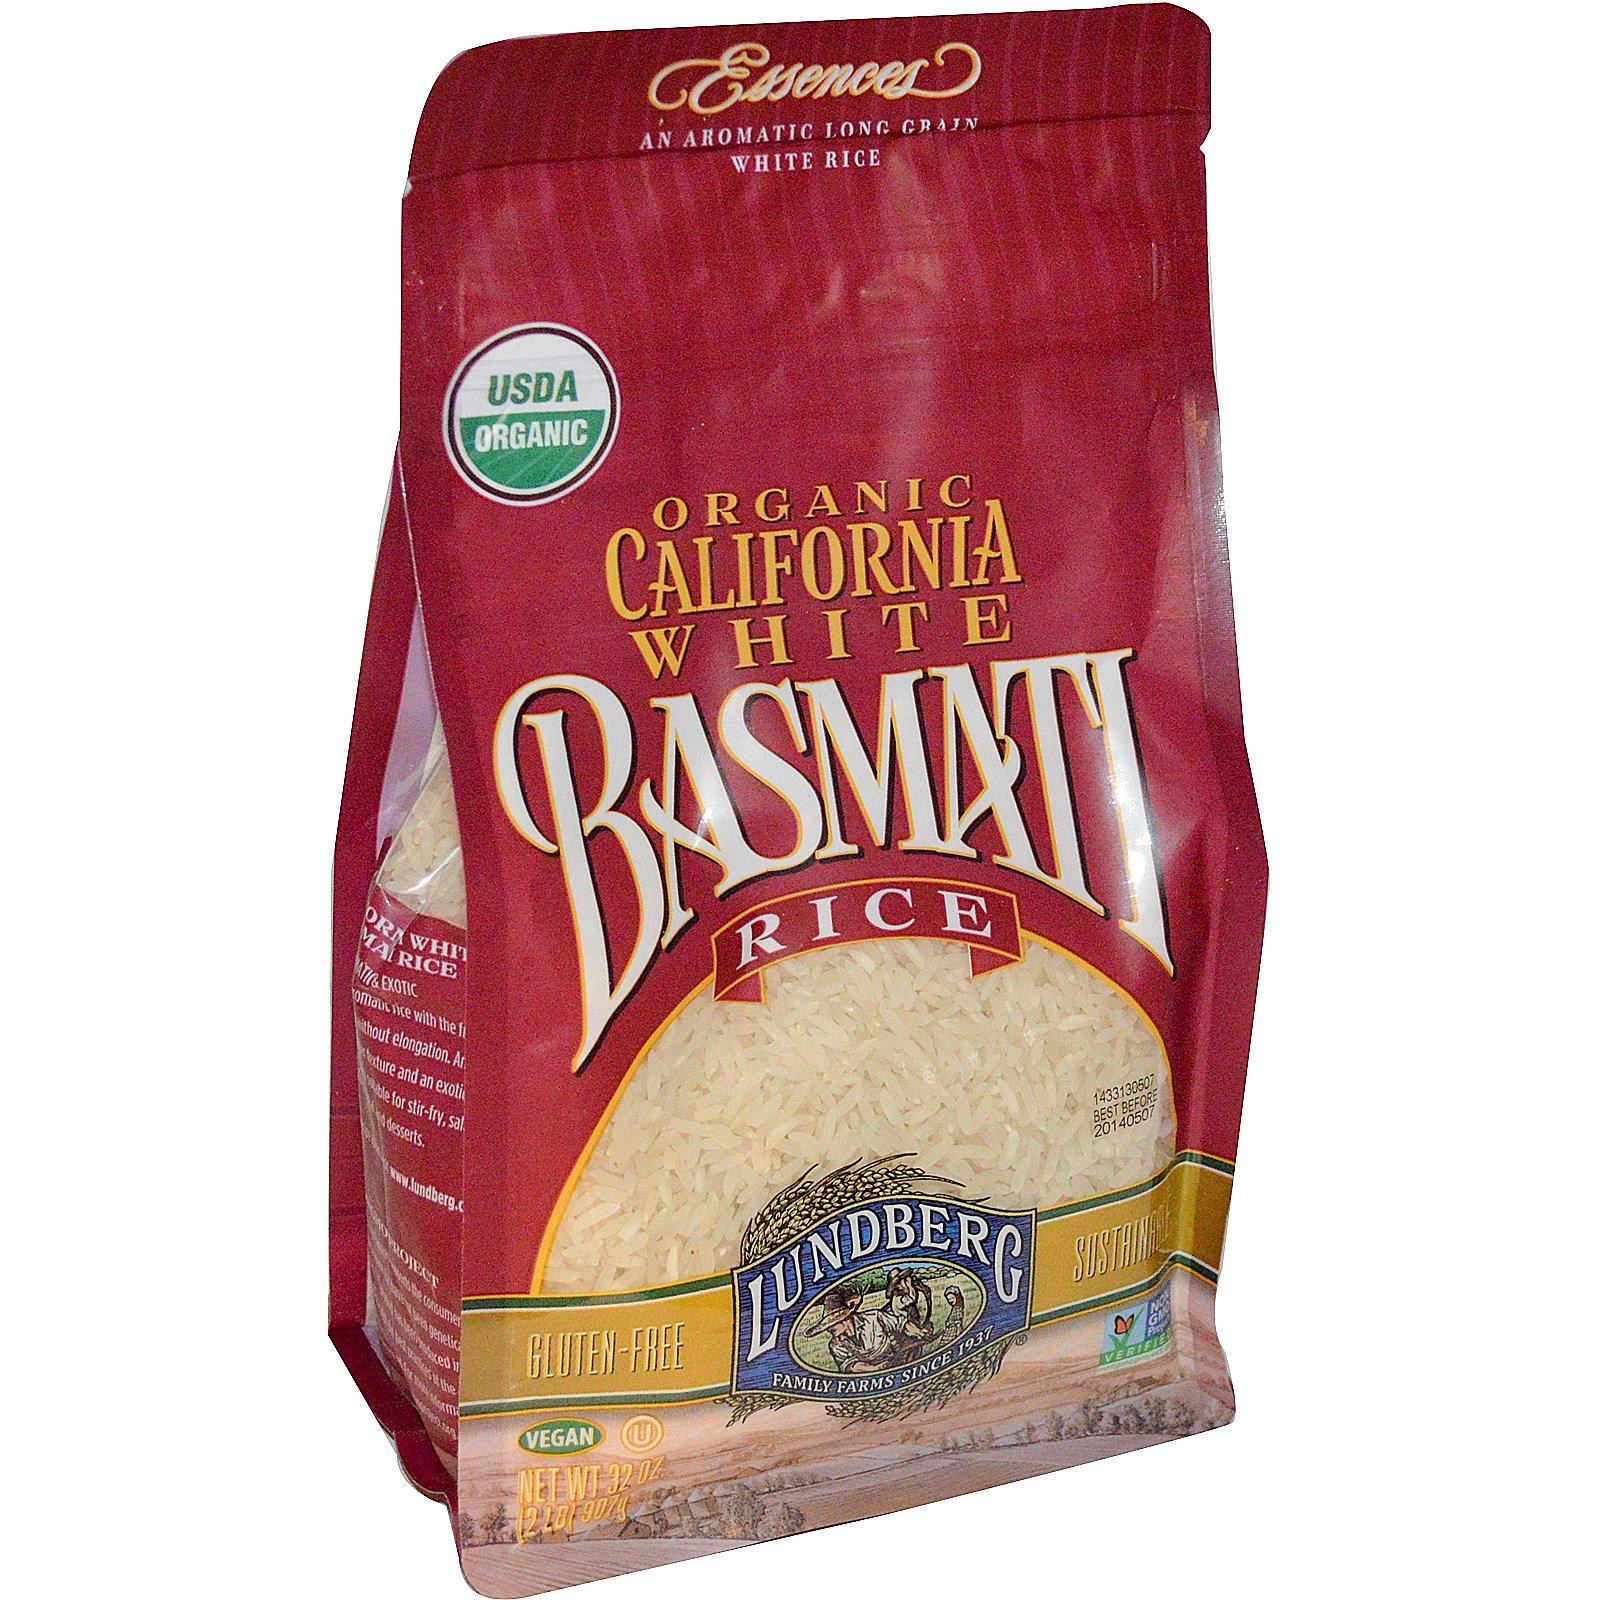 Lundberg, Organic, California White Basmati Rice, 32 oz